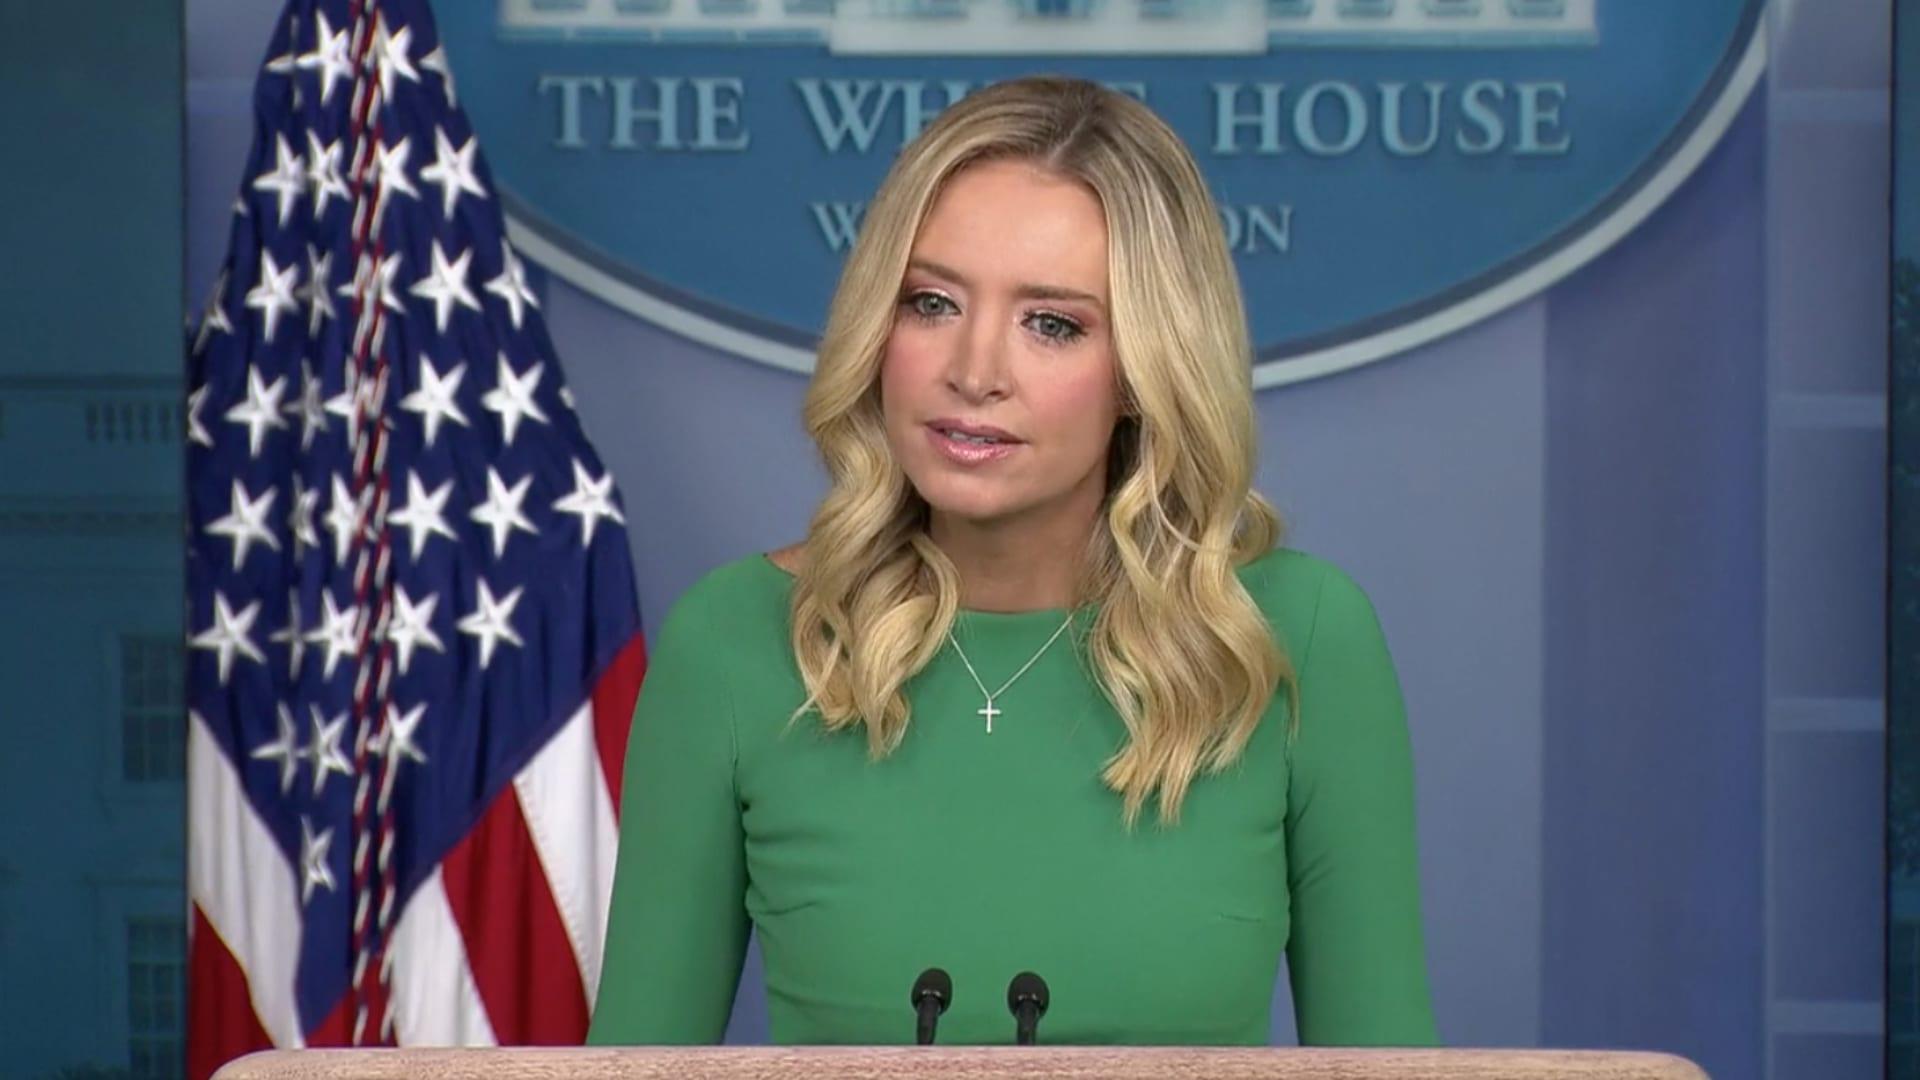 Press Secretary Kayleigh McEnany White House Press Conference Transcript November 20